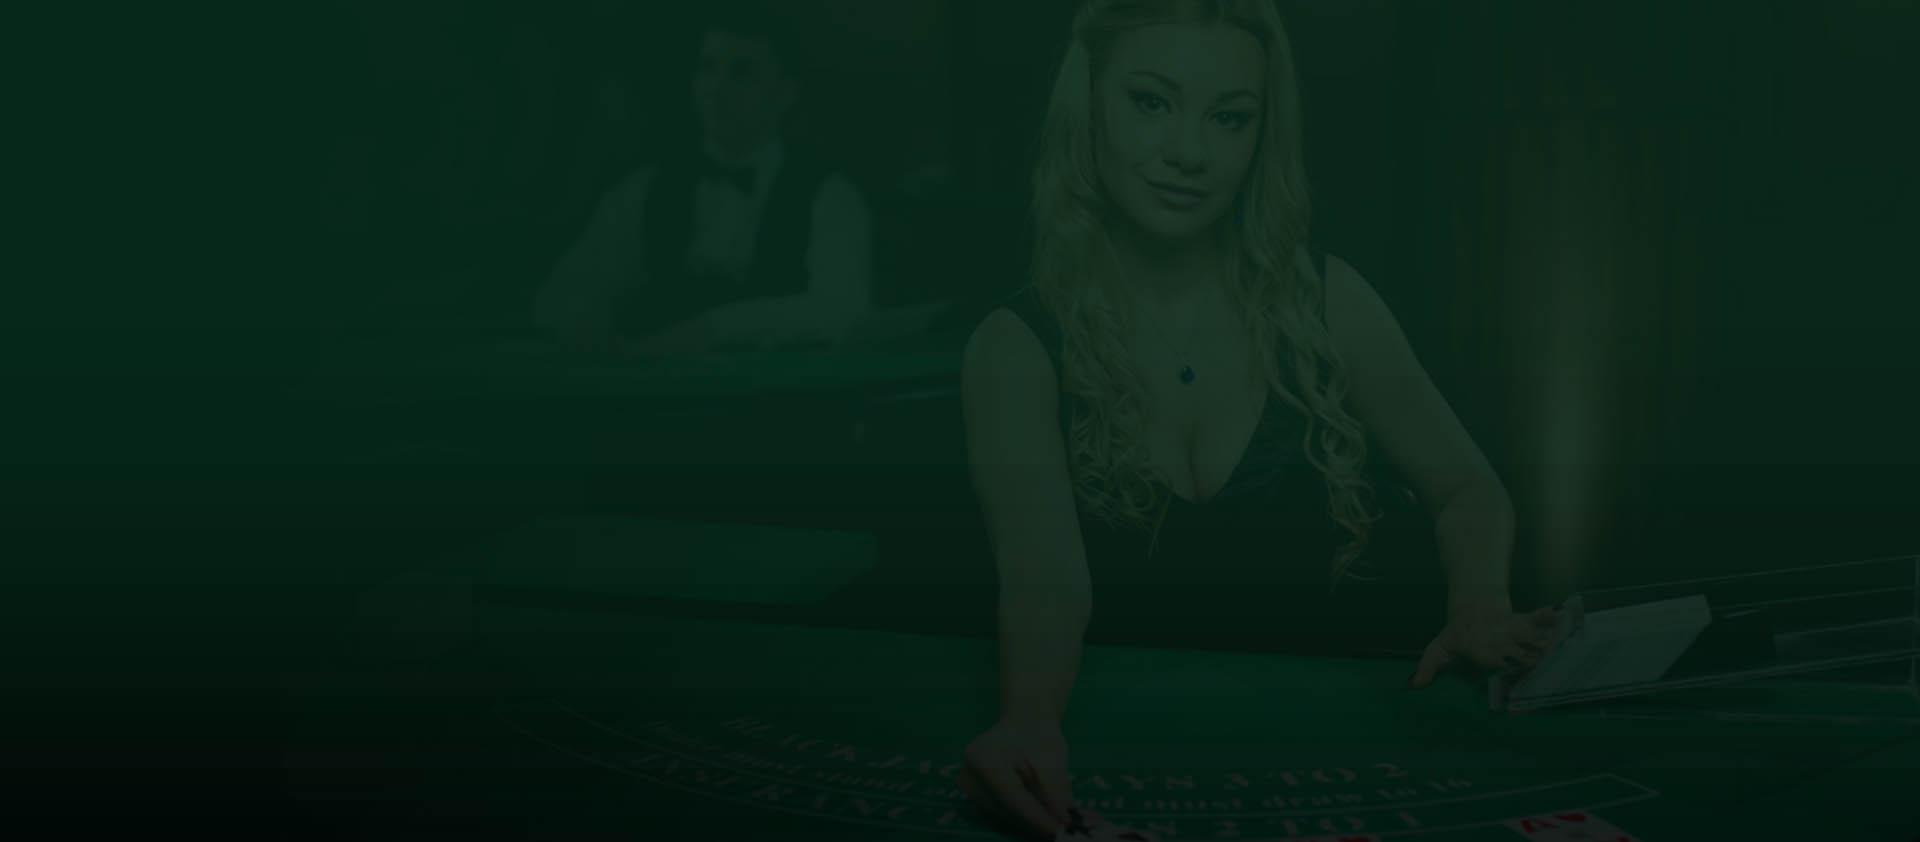 50 free no deposit casino